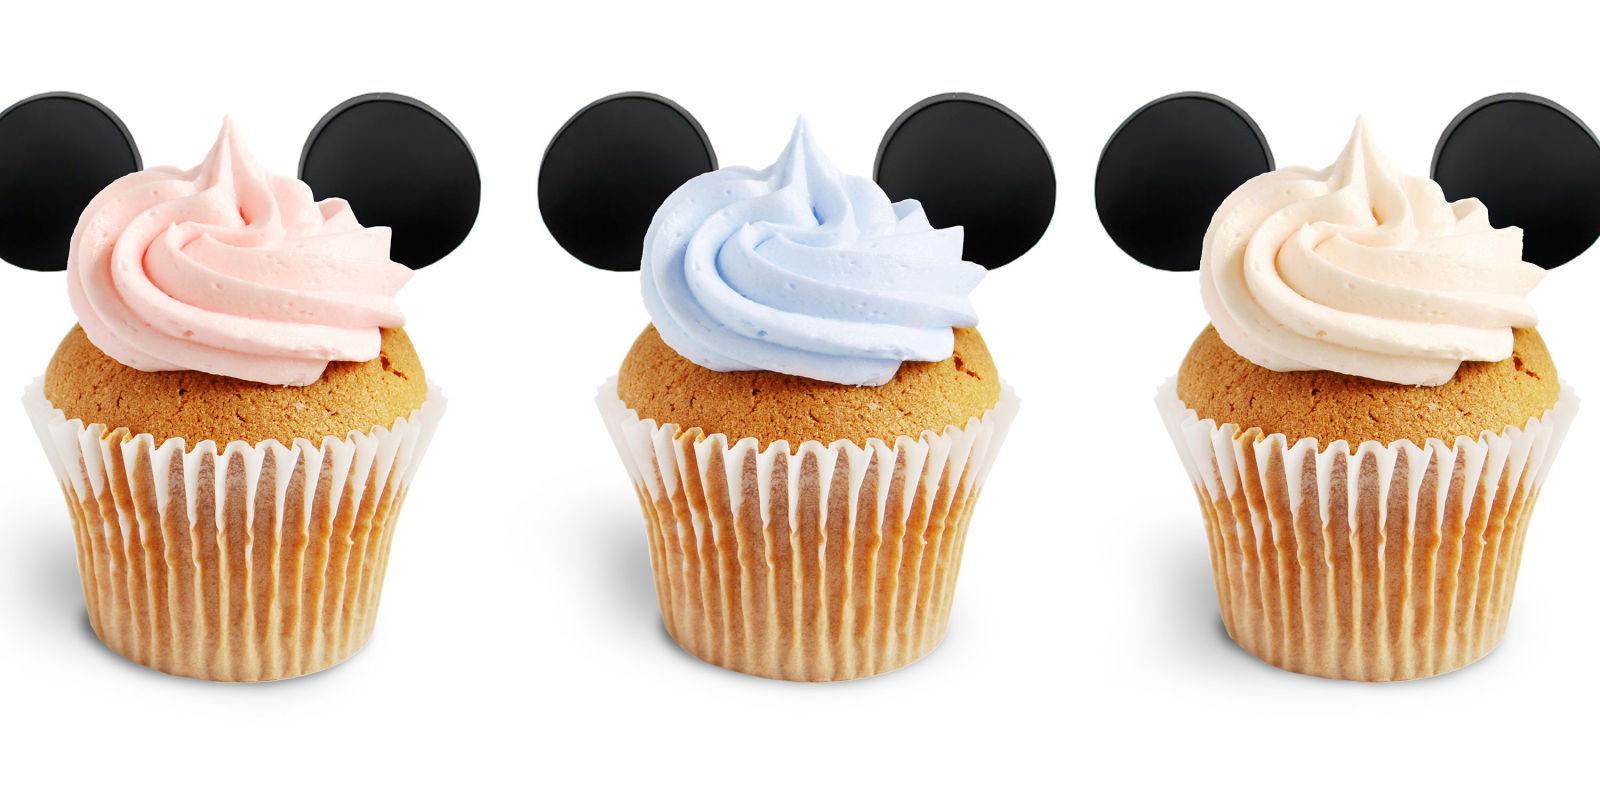 Disney World Now Has A Vegan And Gluten Free Bakery